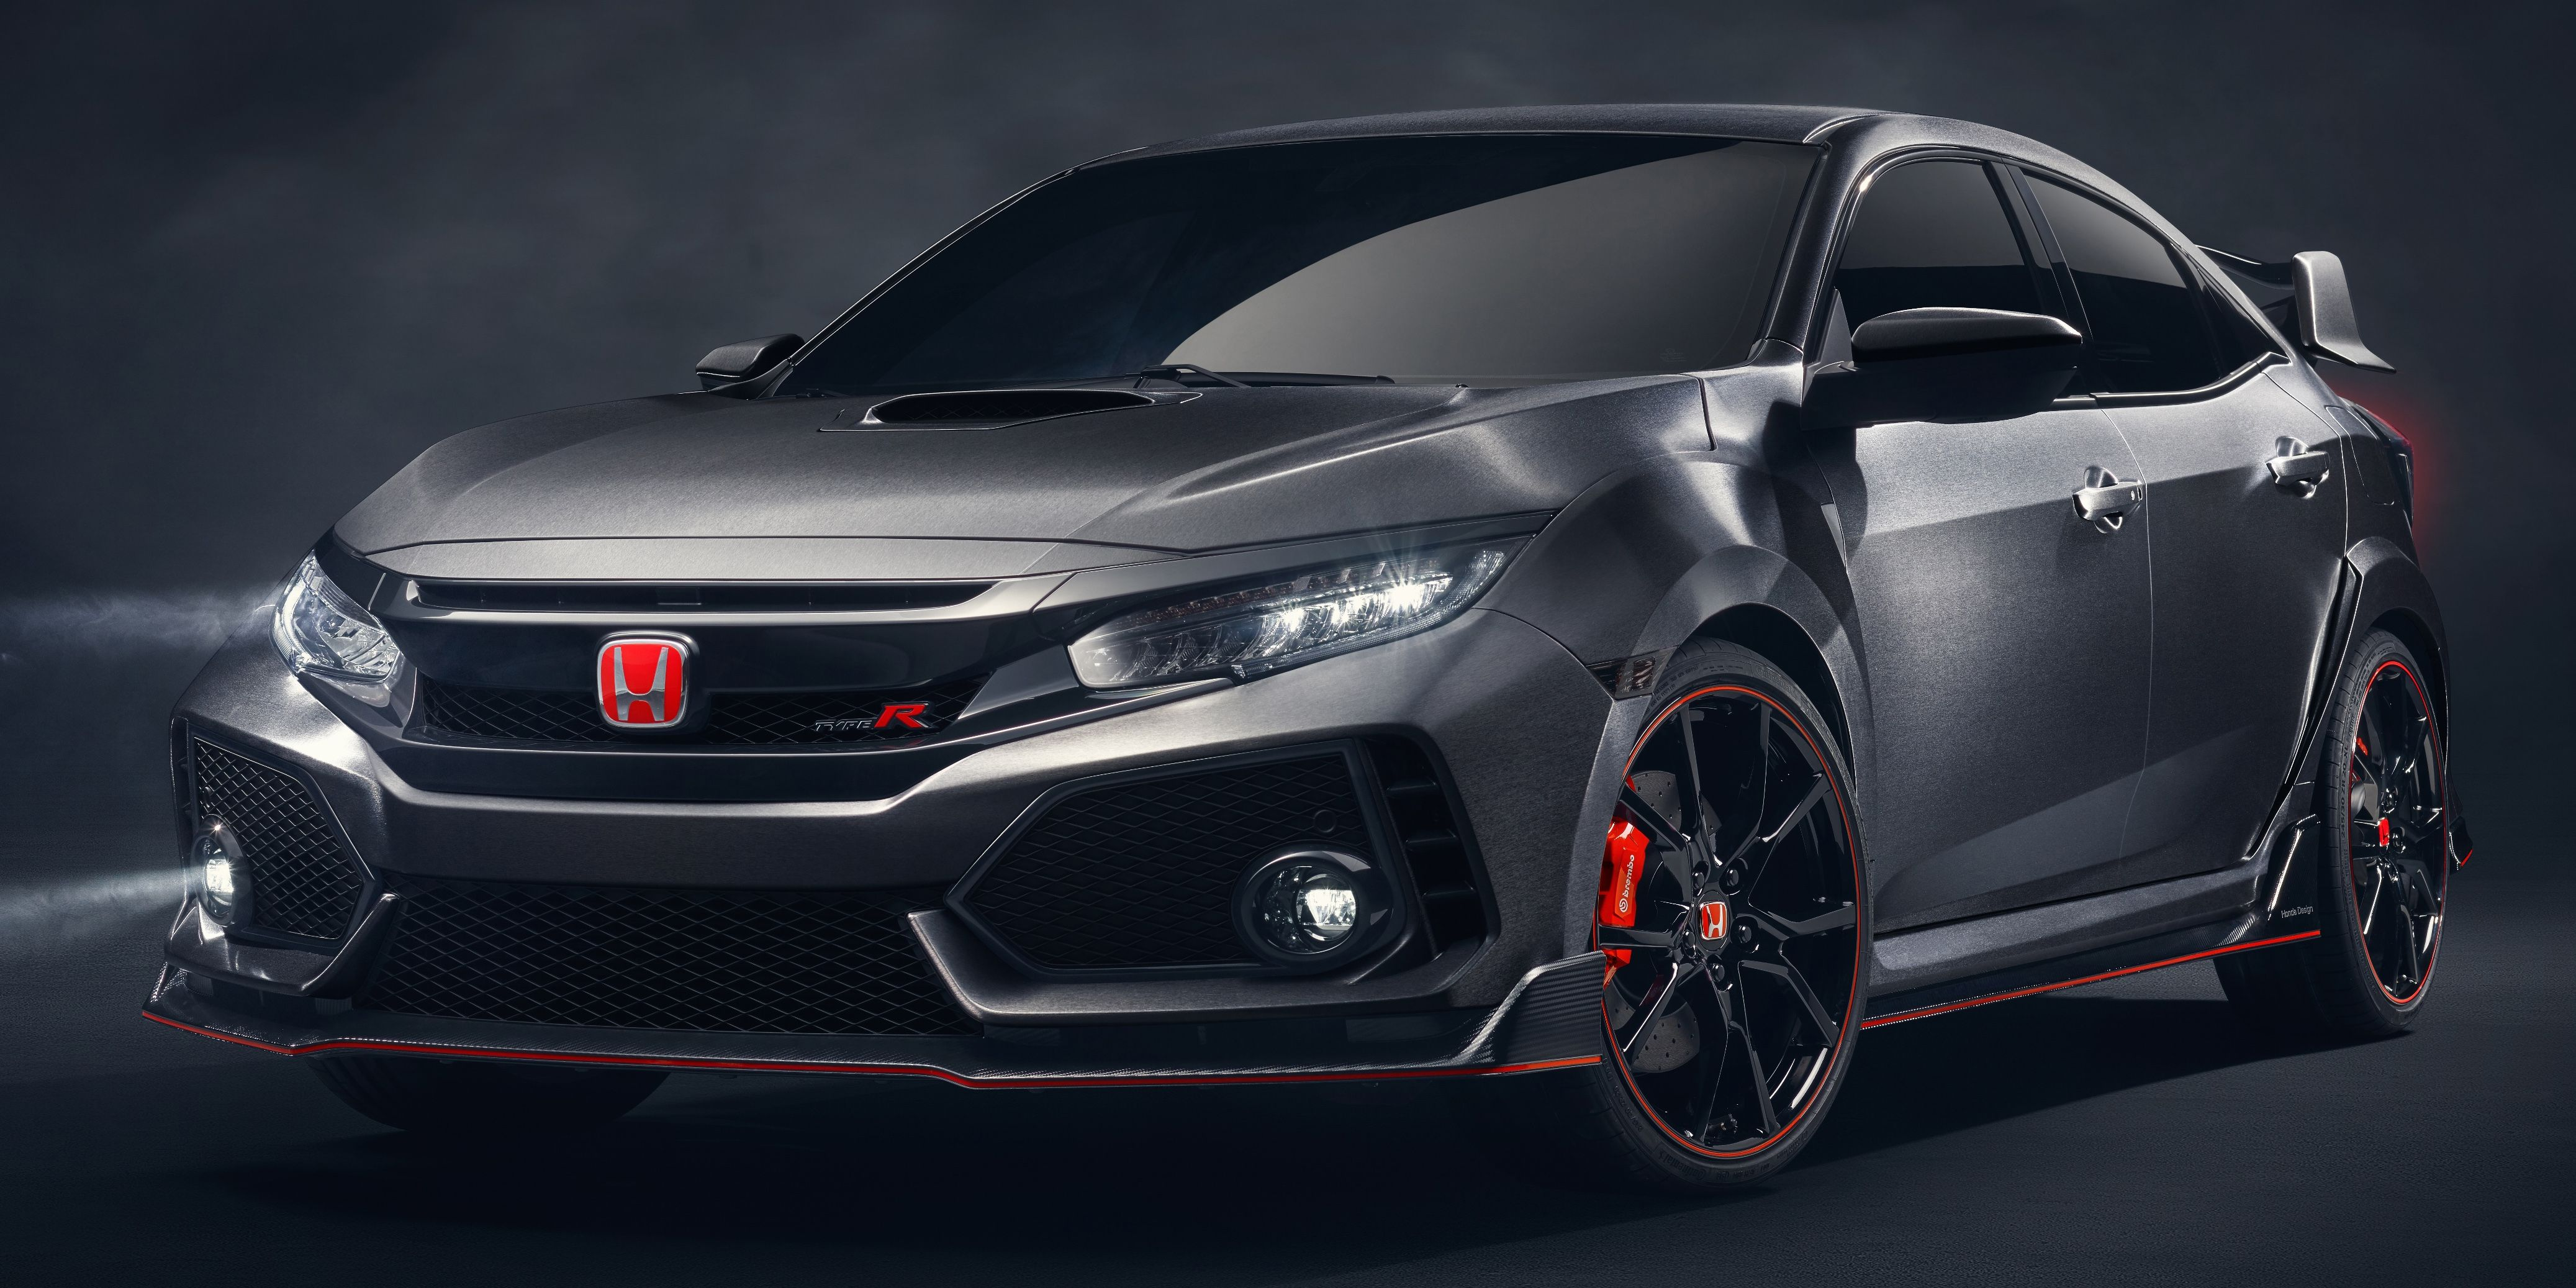 New Civic Type R